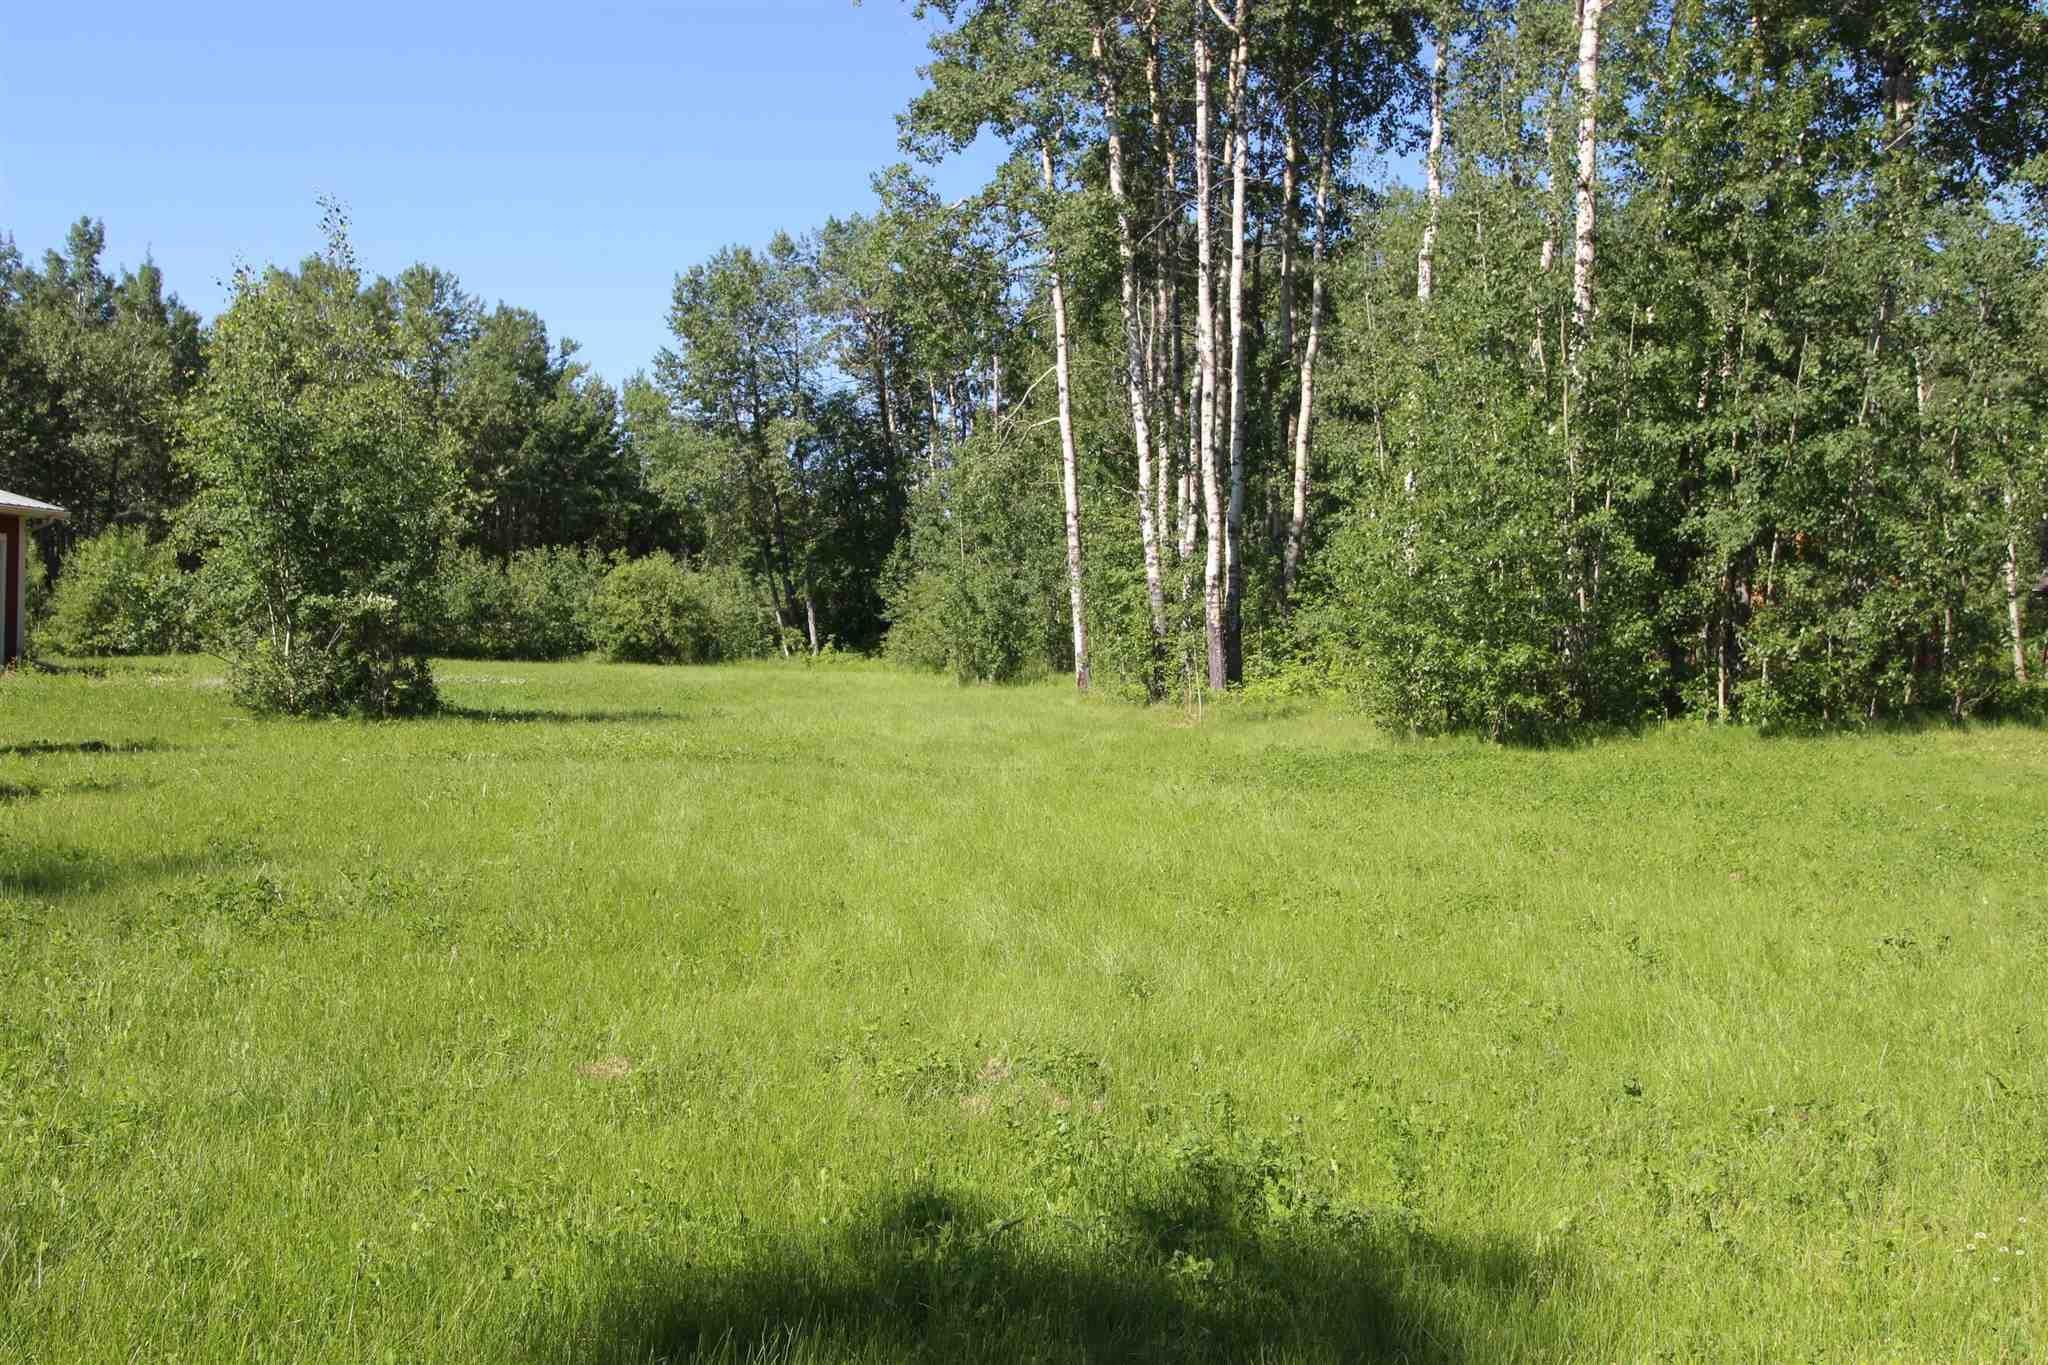 Main Photo: 568 Beach Road: Rural Wetaskiwin County Rural Land/Vacant Lot for sale : MLS®# E4251590